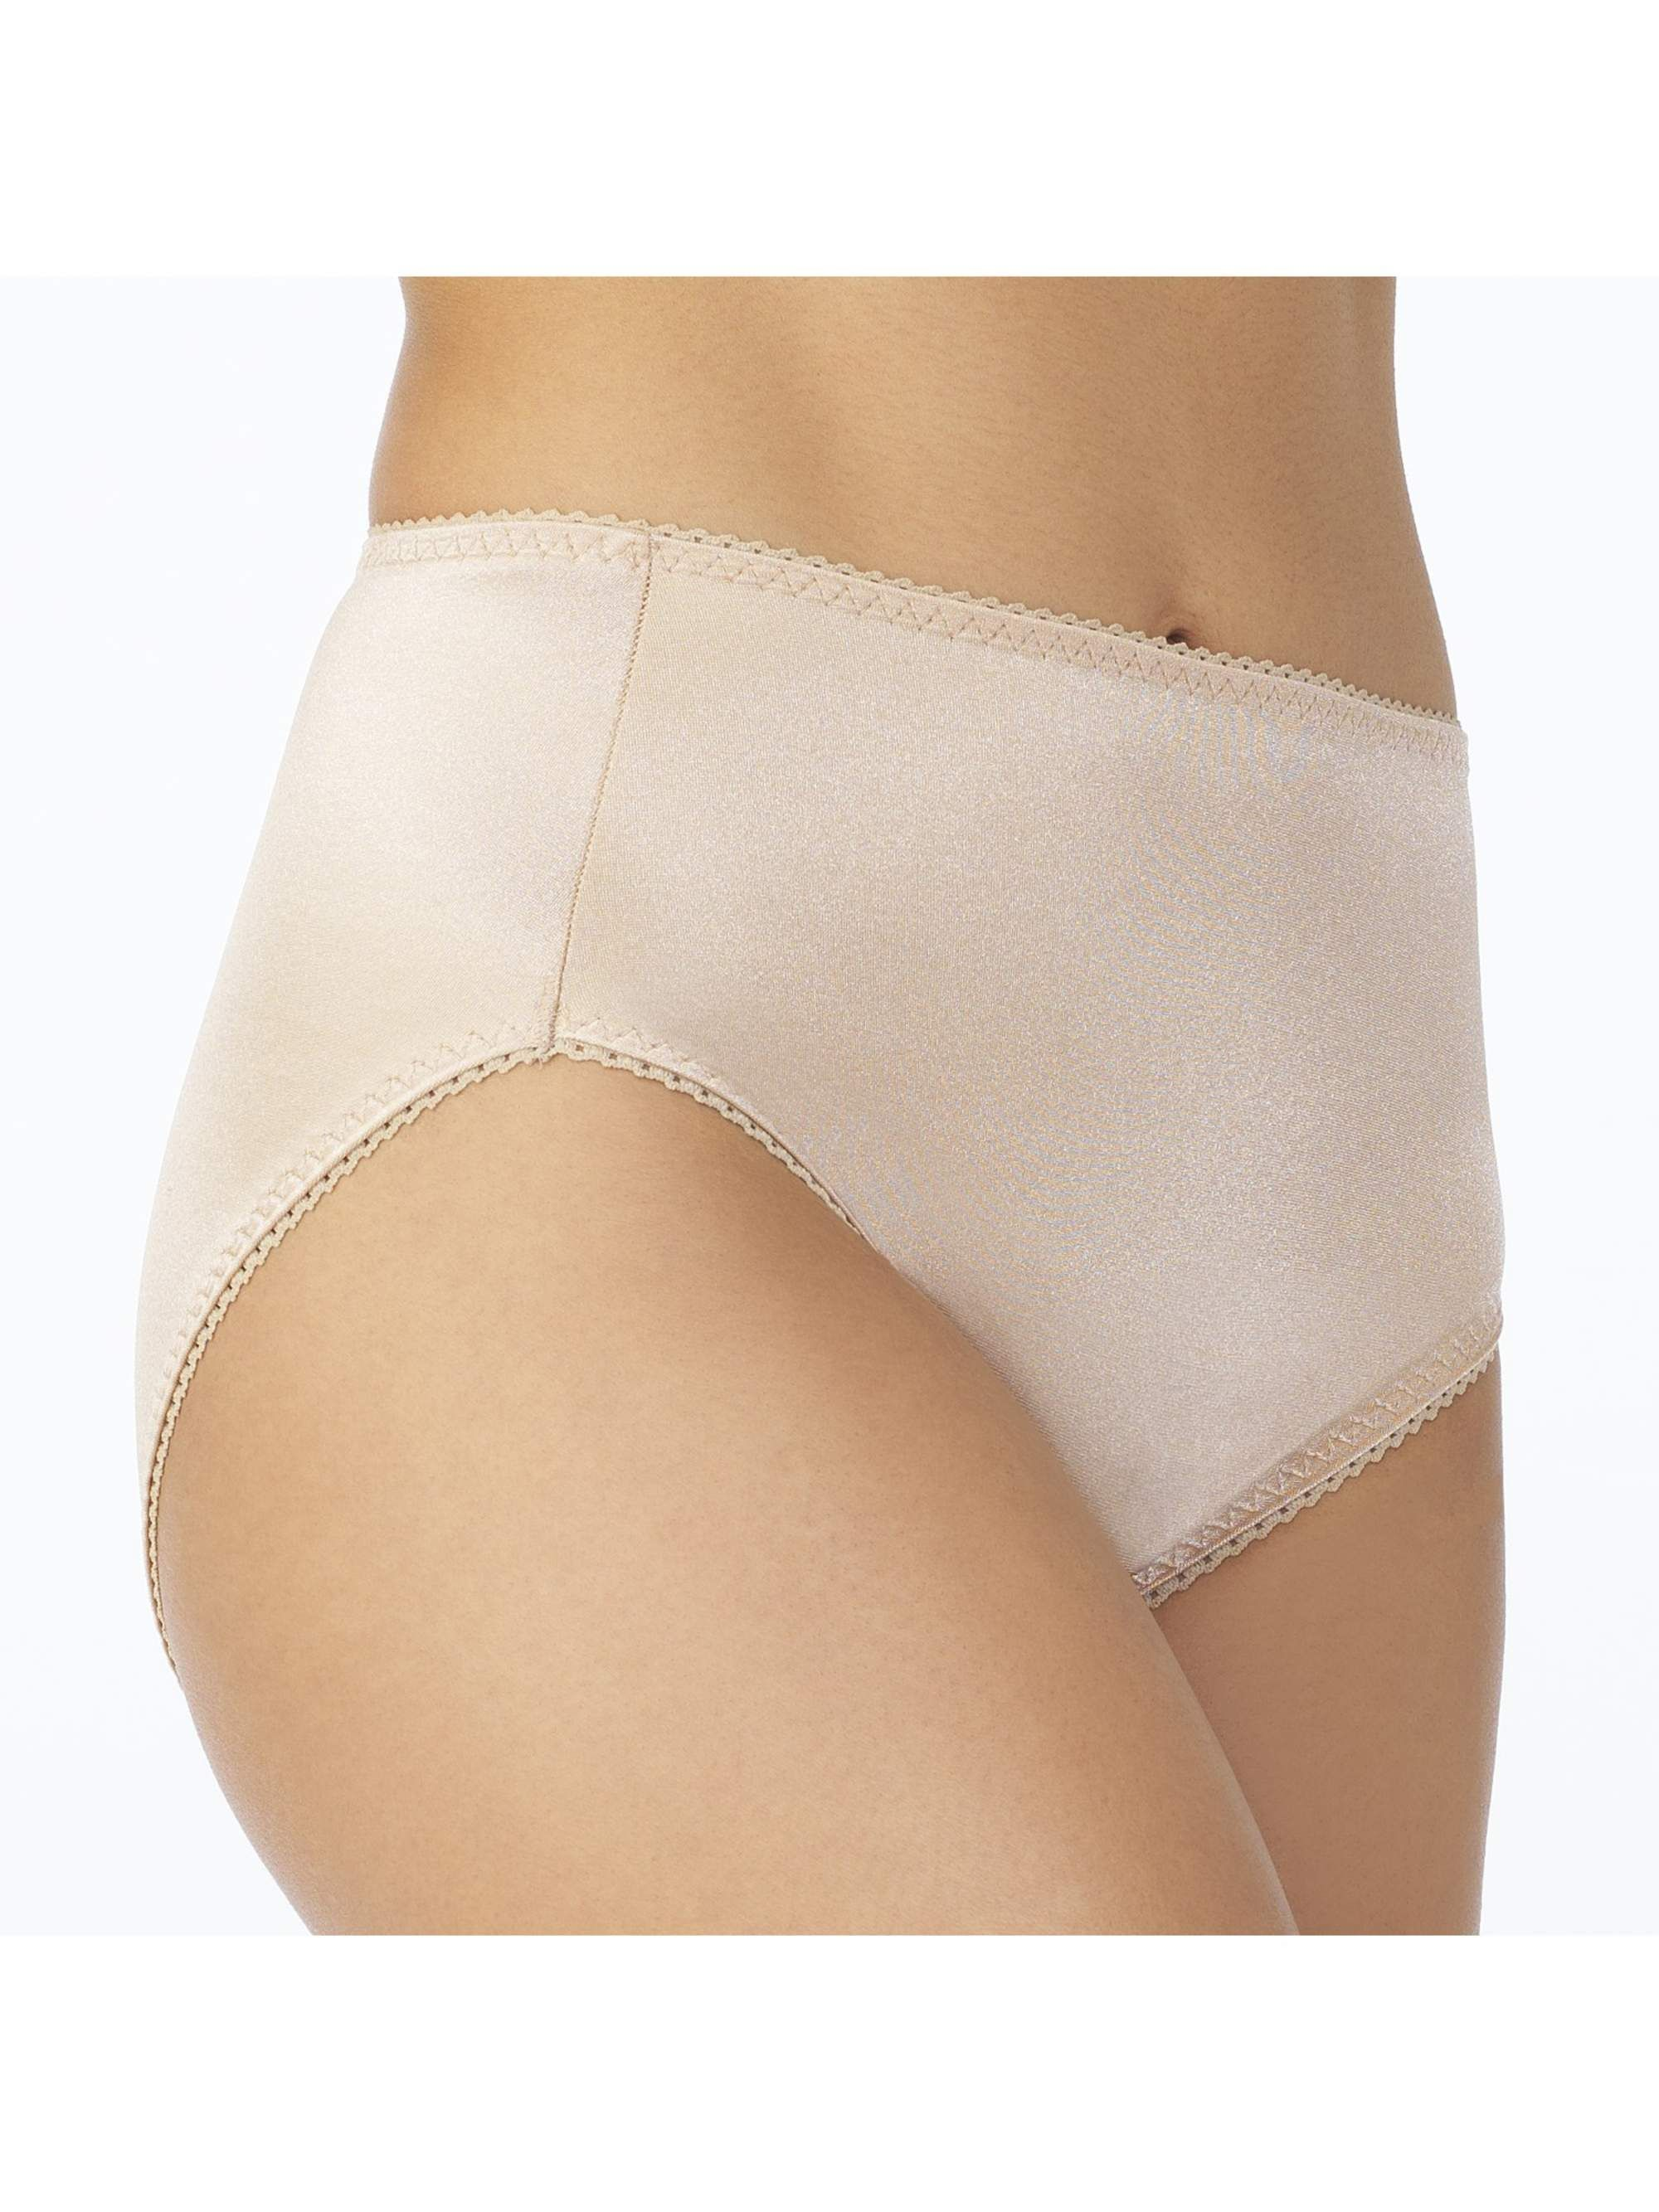 de34af1050d8 Women's Undershapers Light Control Hi Cut Panties, Style 48001#Light, # Control, #Women